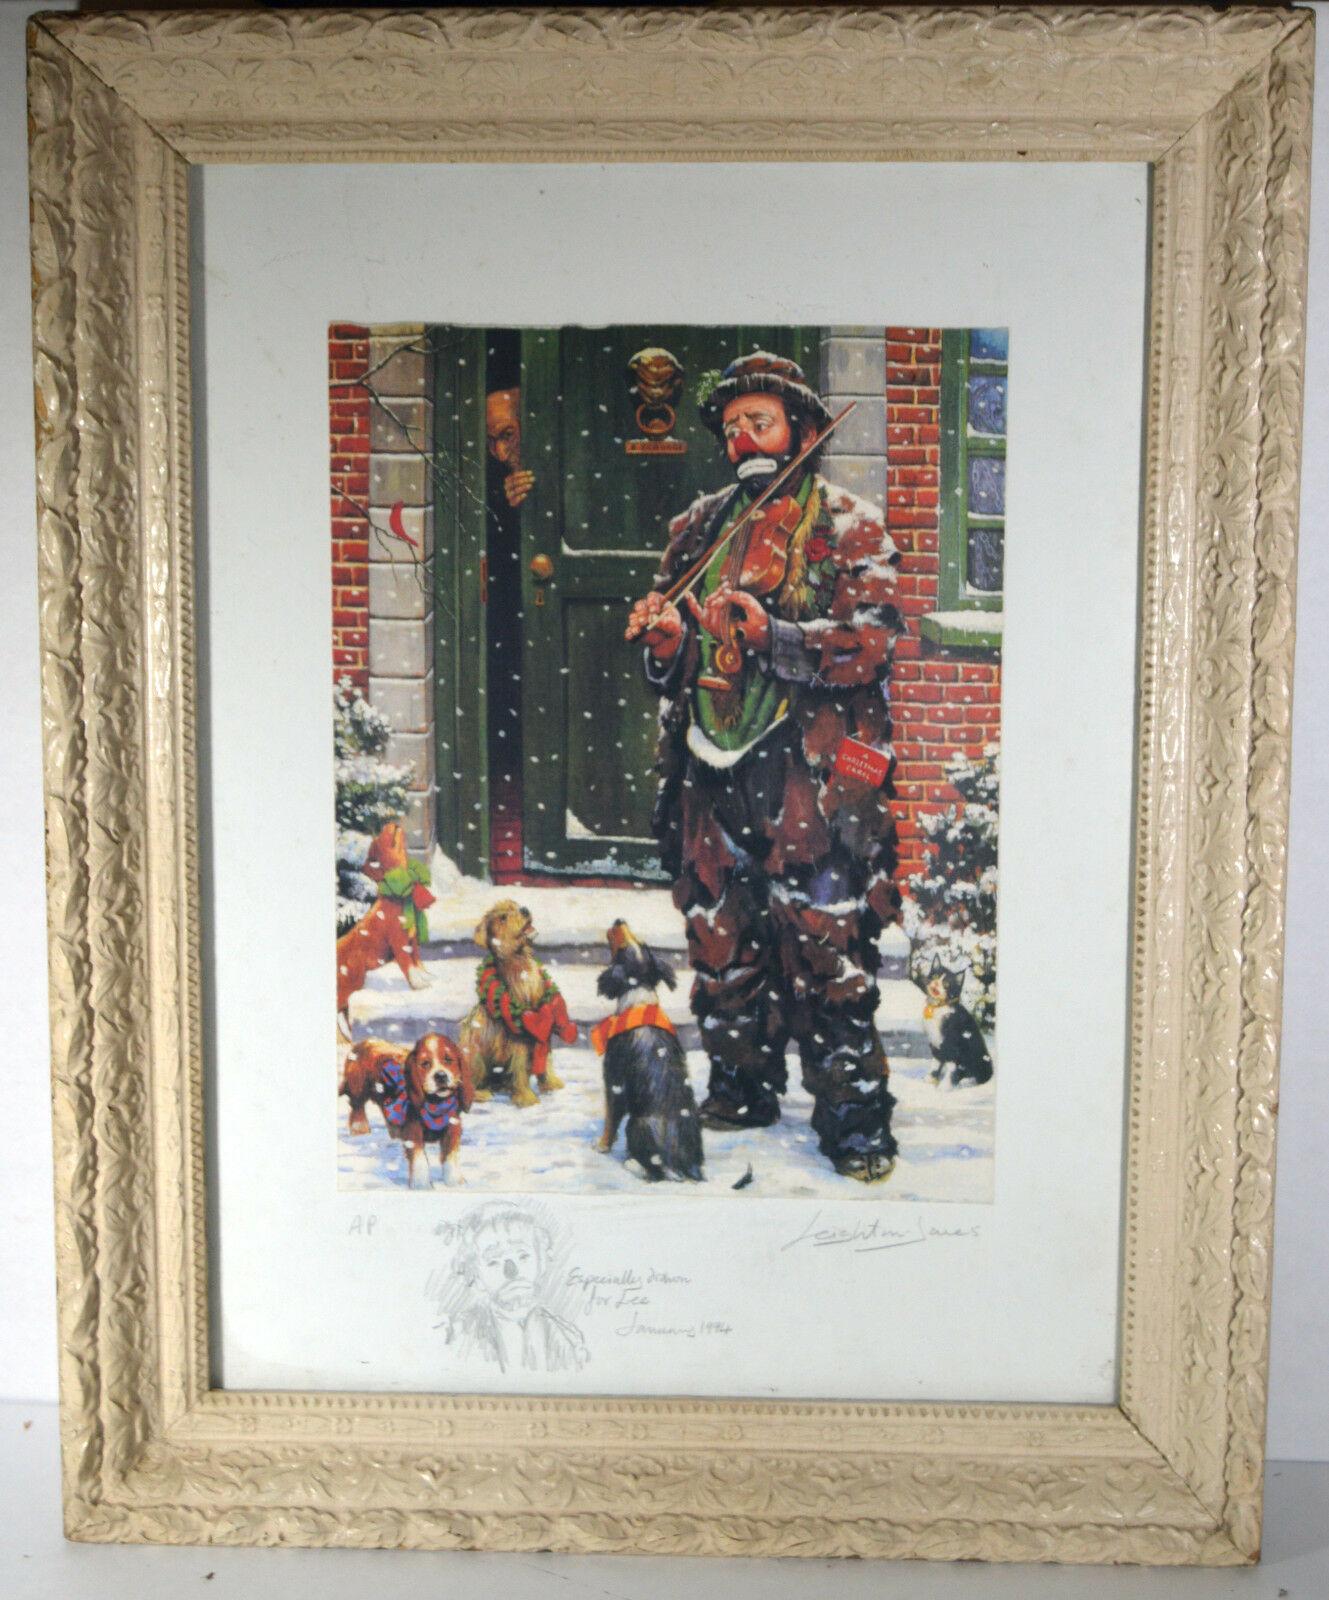 Unique Signed Artist Proof Leighton Jones Emmett Kelly Christmas Carol Scrooge